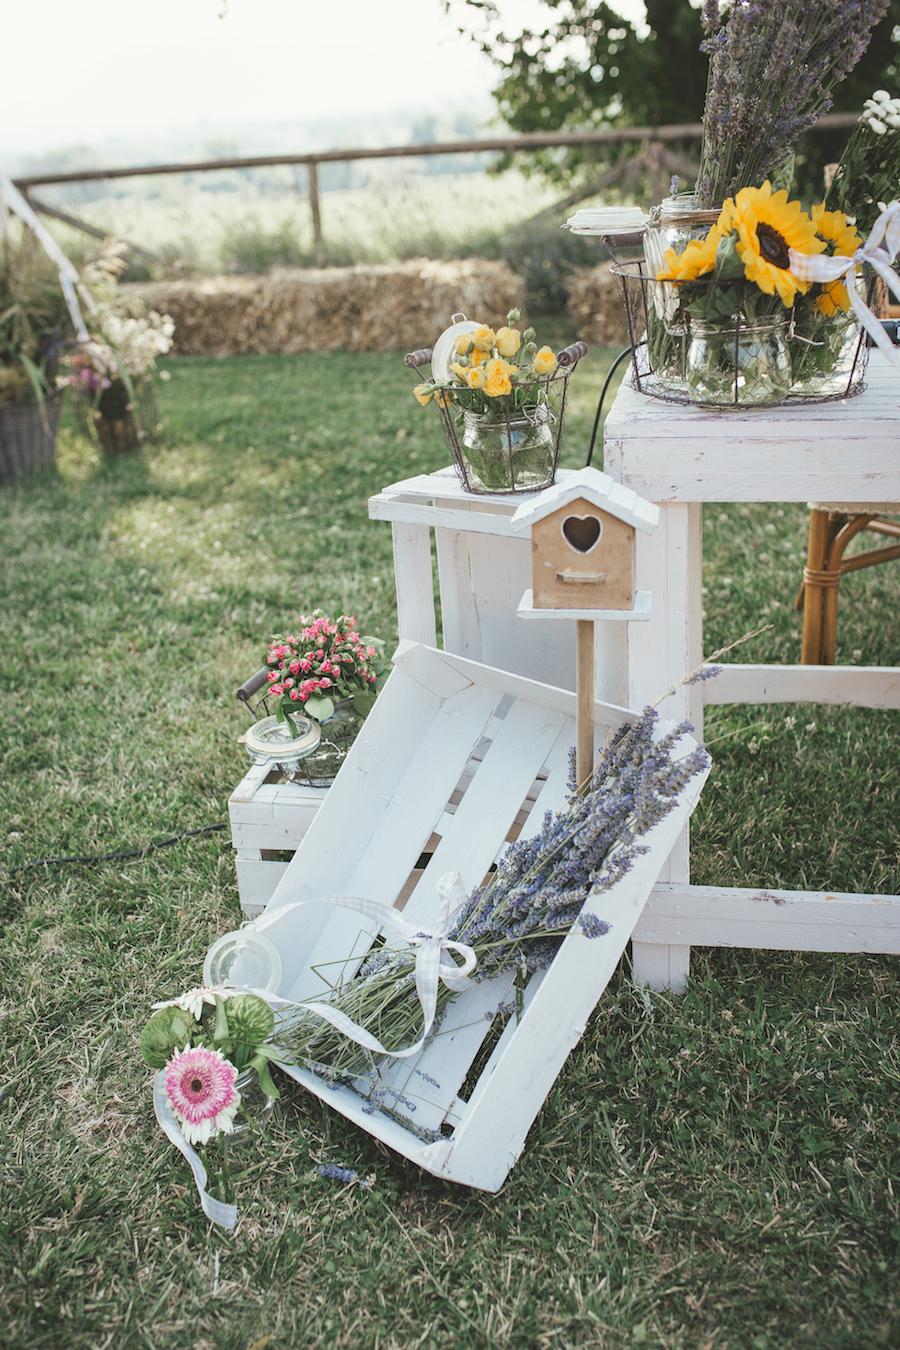 matrimonio-ecofriendly-a-caserta-gabriella-rotondi-wedding-wondeland-09